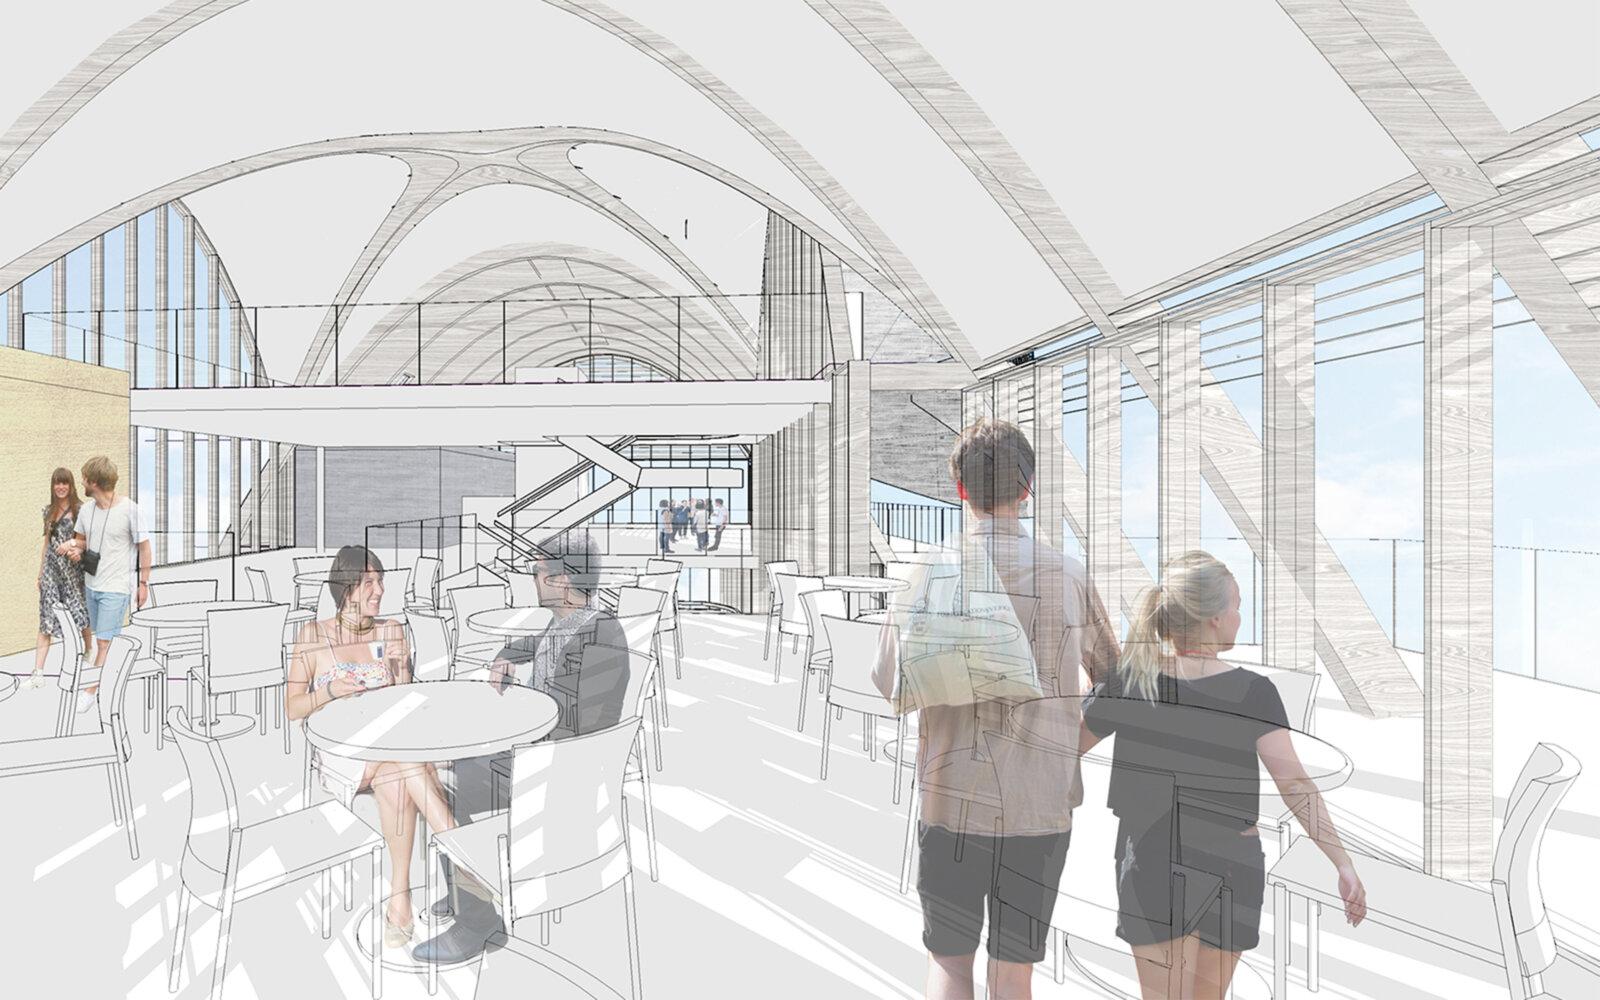 Southend Pier Pavilion internal sketch